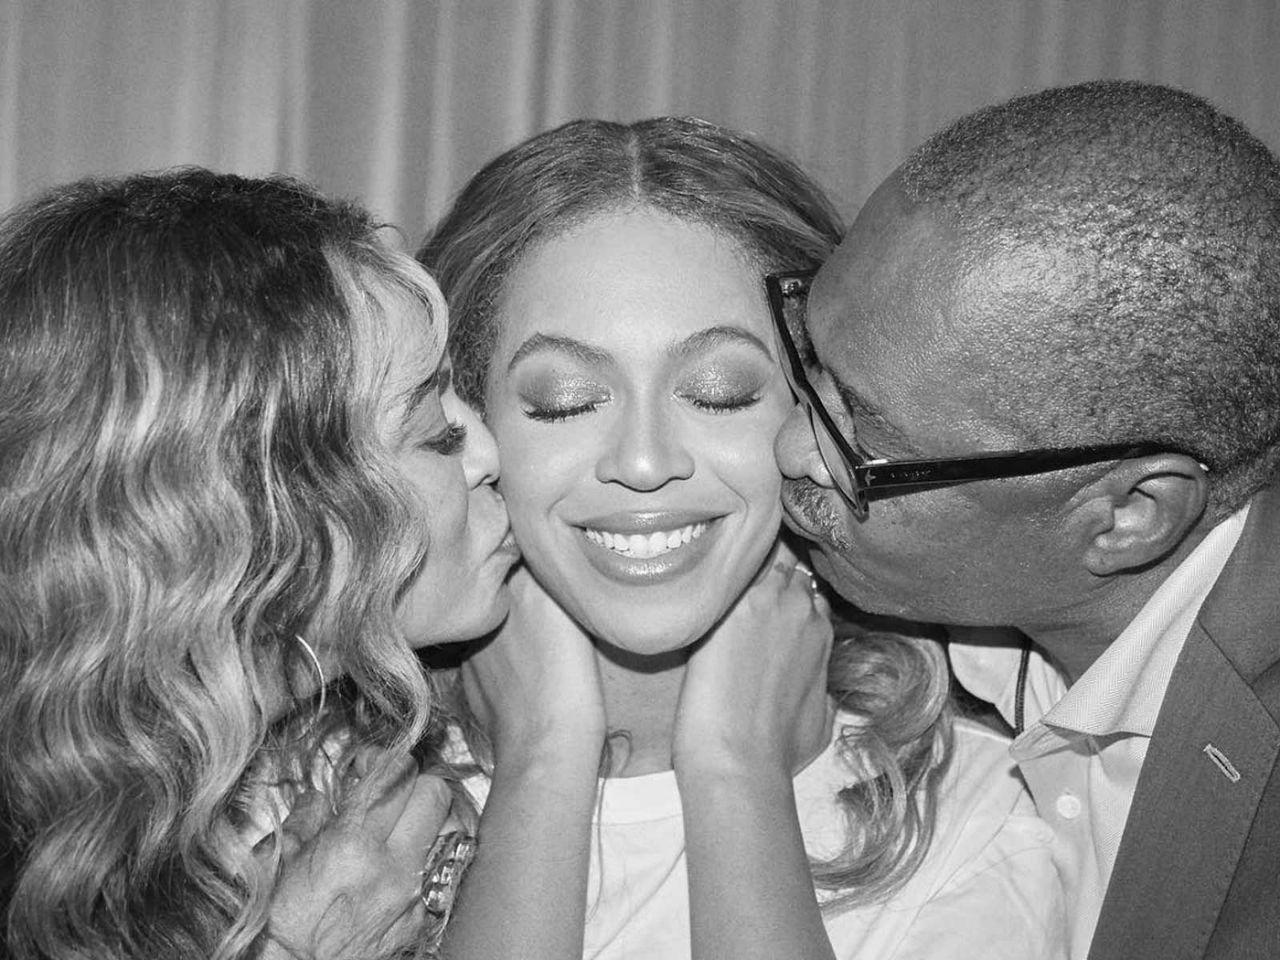 Beyoncé's Dad, Mathew Knowles, Has Breast Cancer